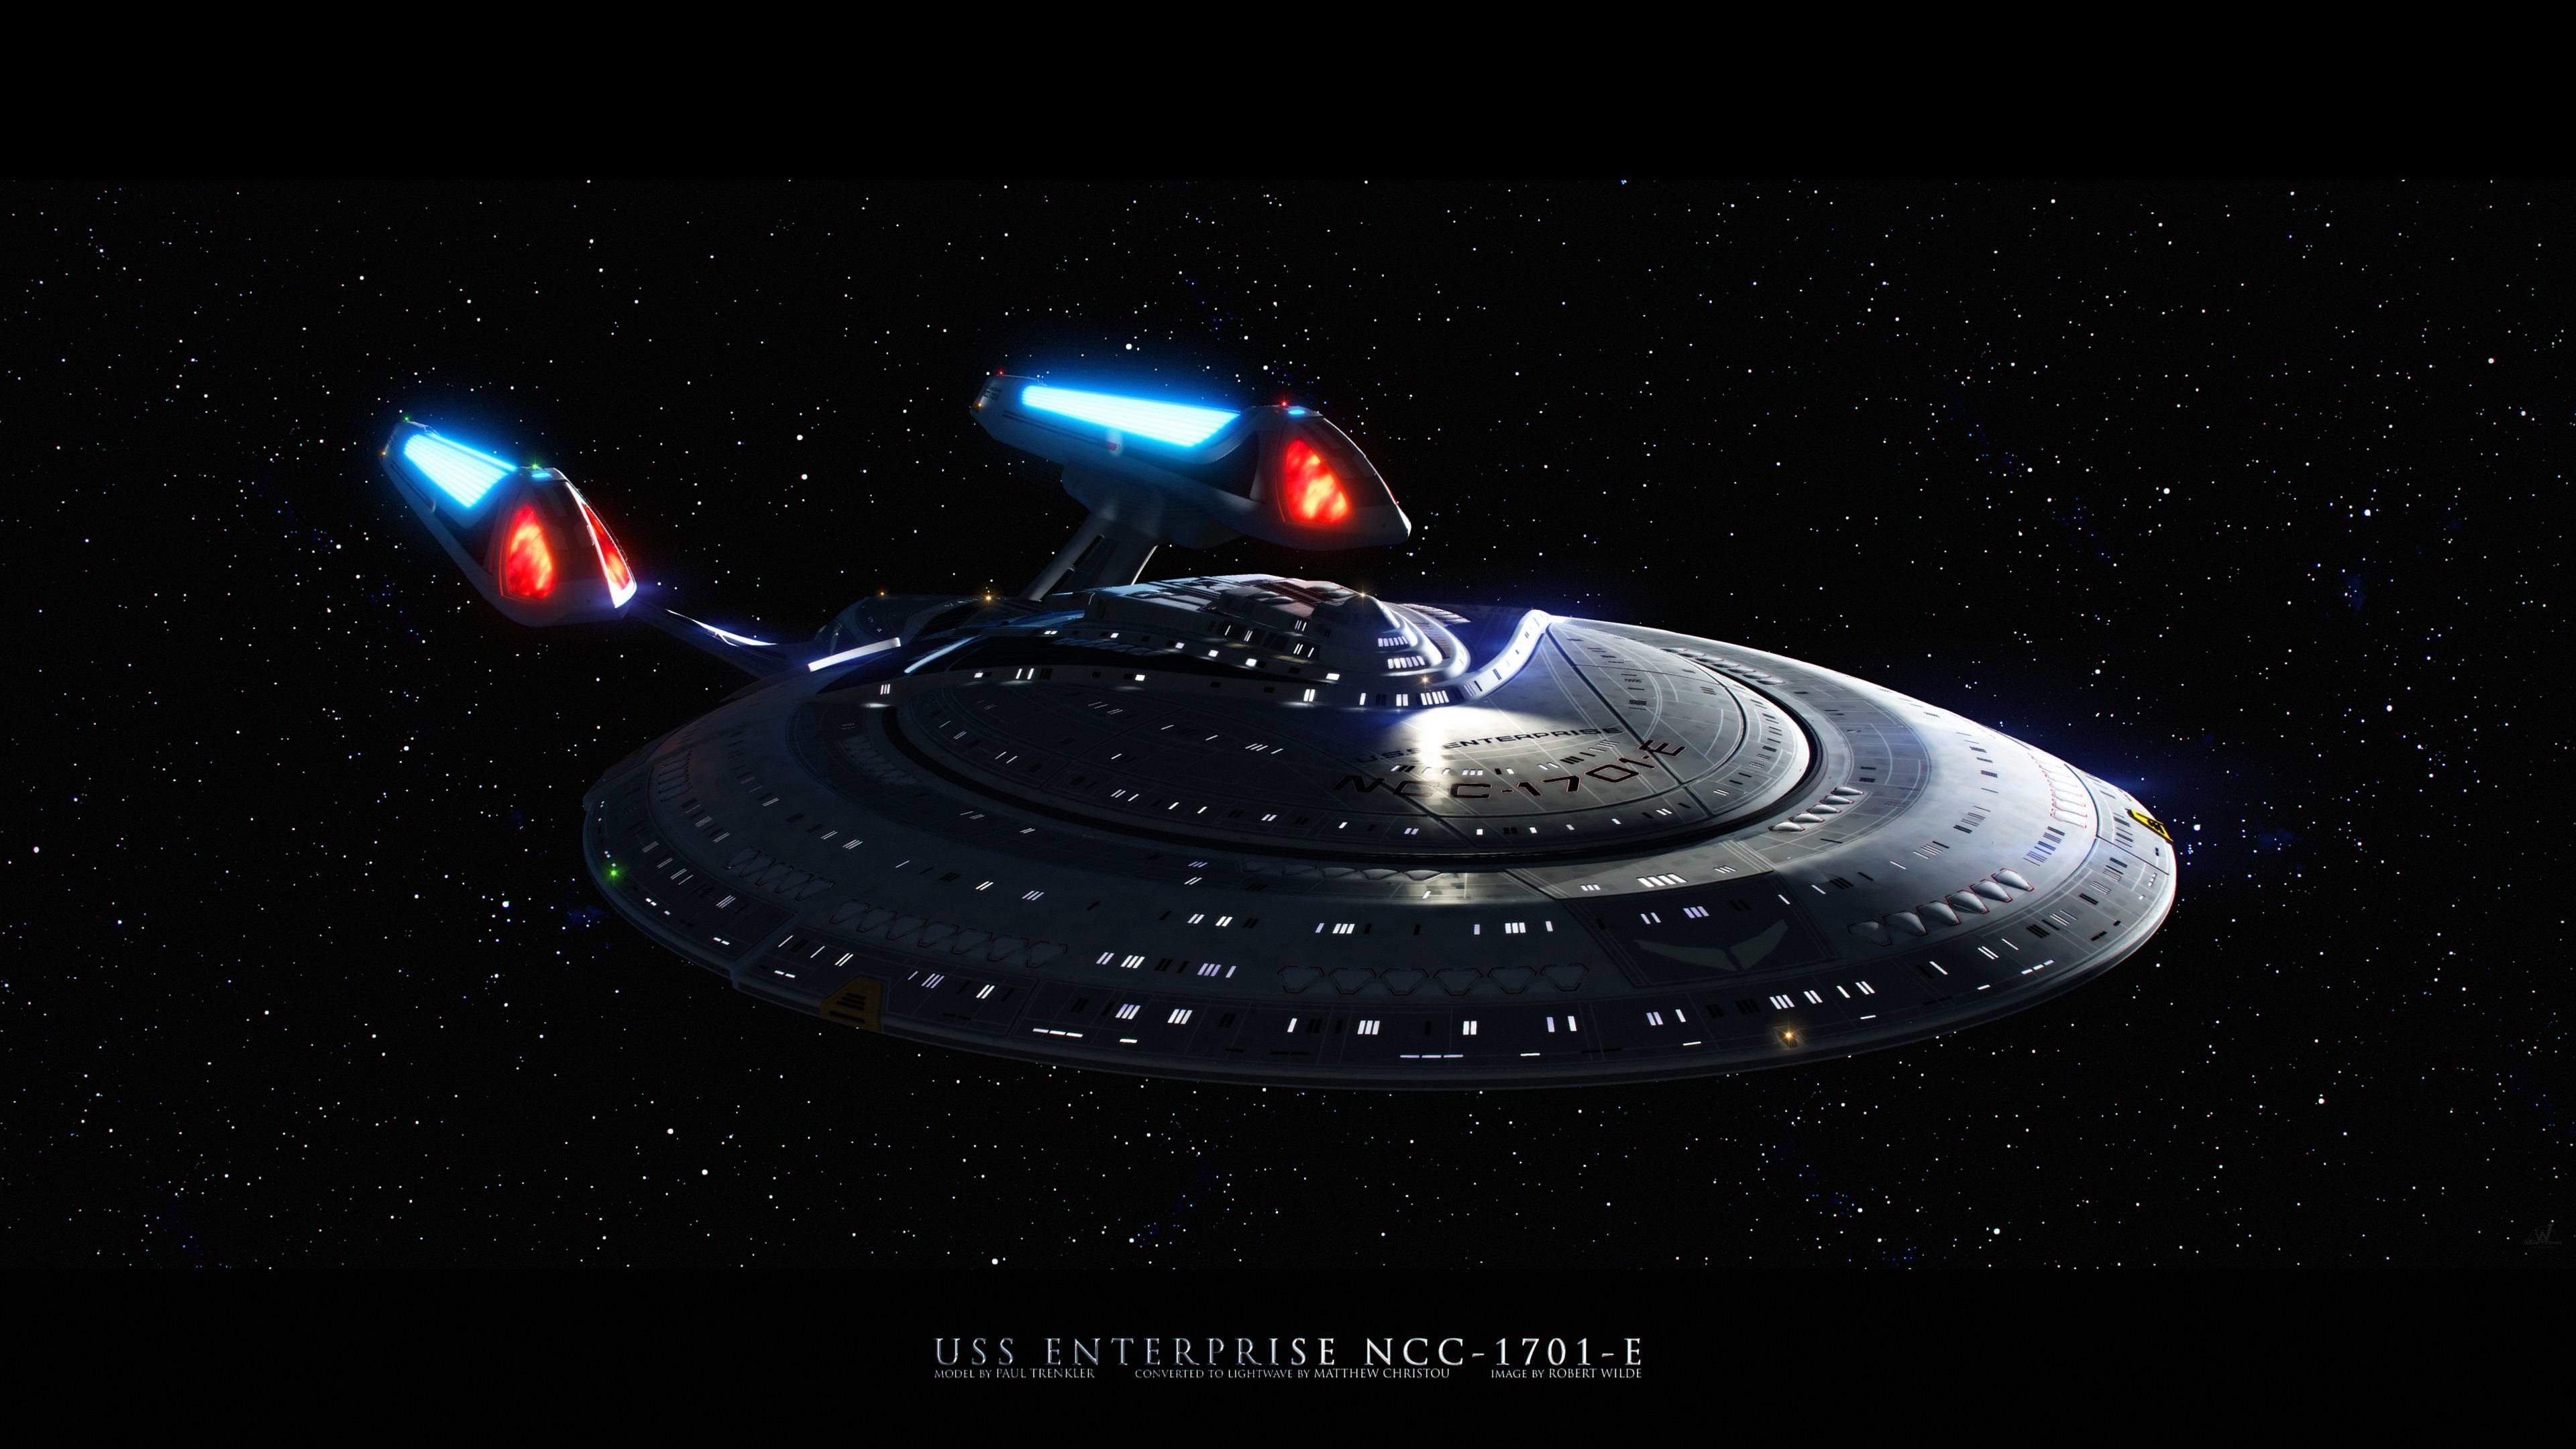 Fonds d'écran Star Trek : tous les wallpapers Star Trek